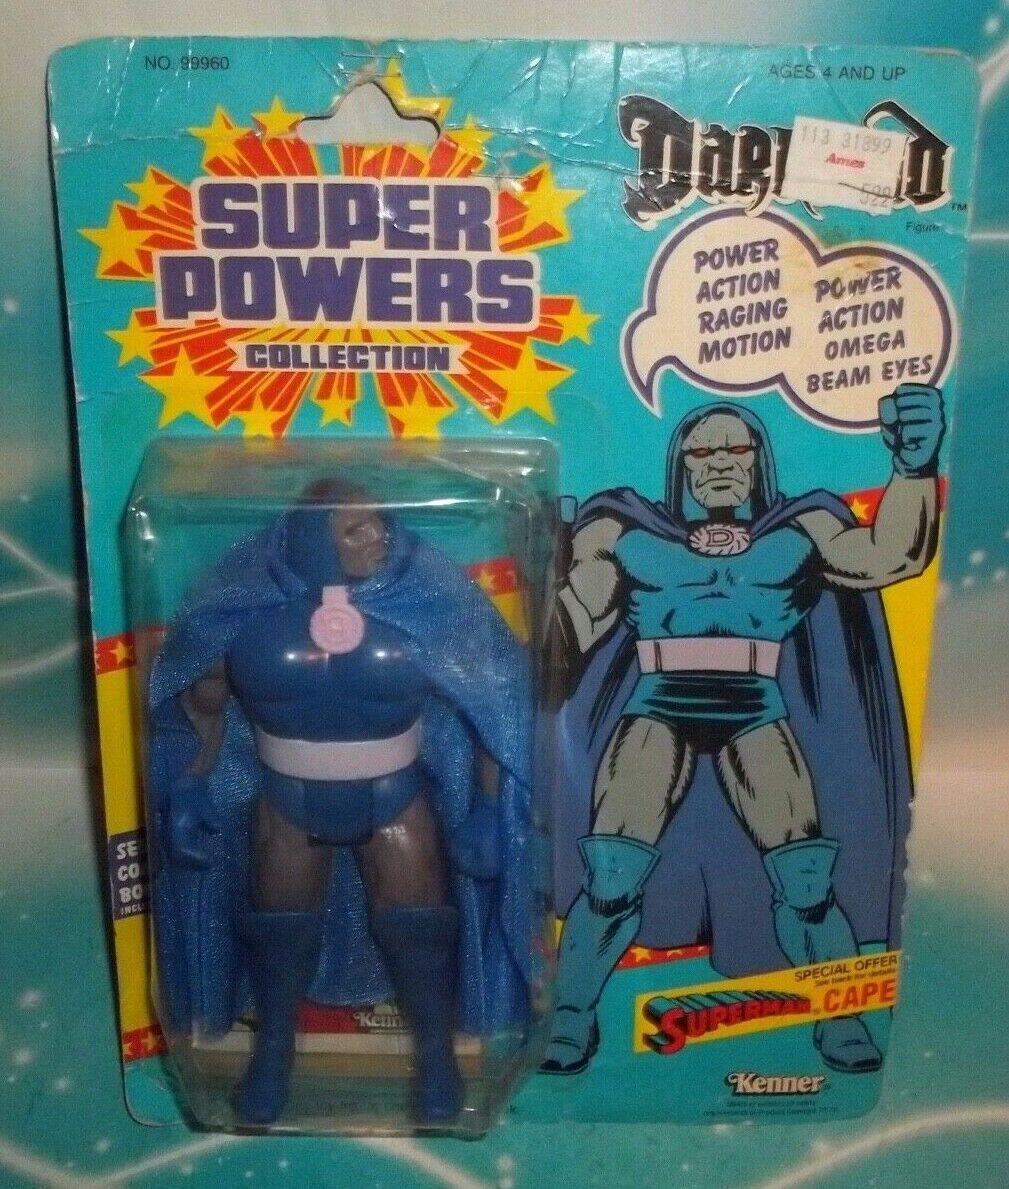 DC SUPER POWERS DARKSEID OF APOCALYPSE FIGURE KENNER 1985 MOC